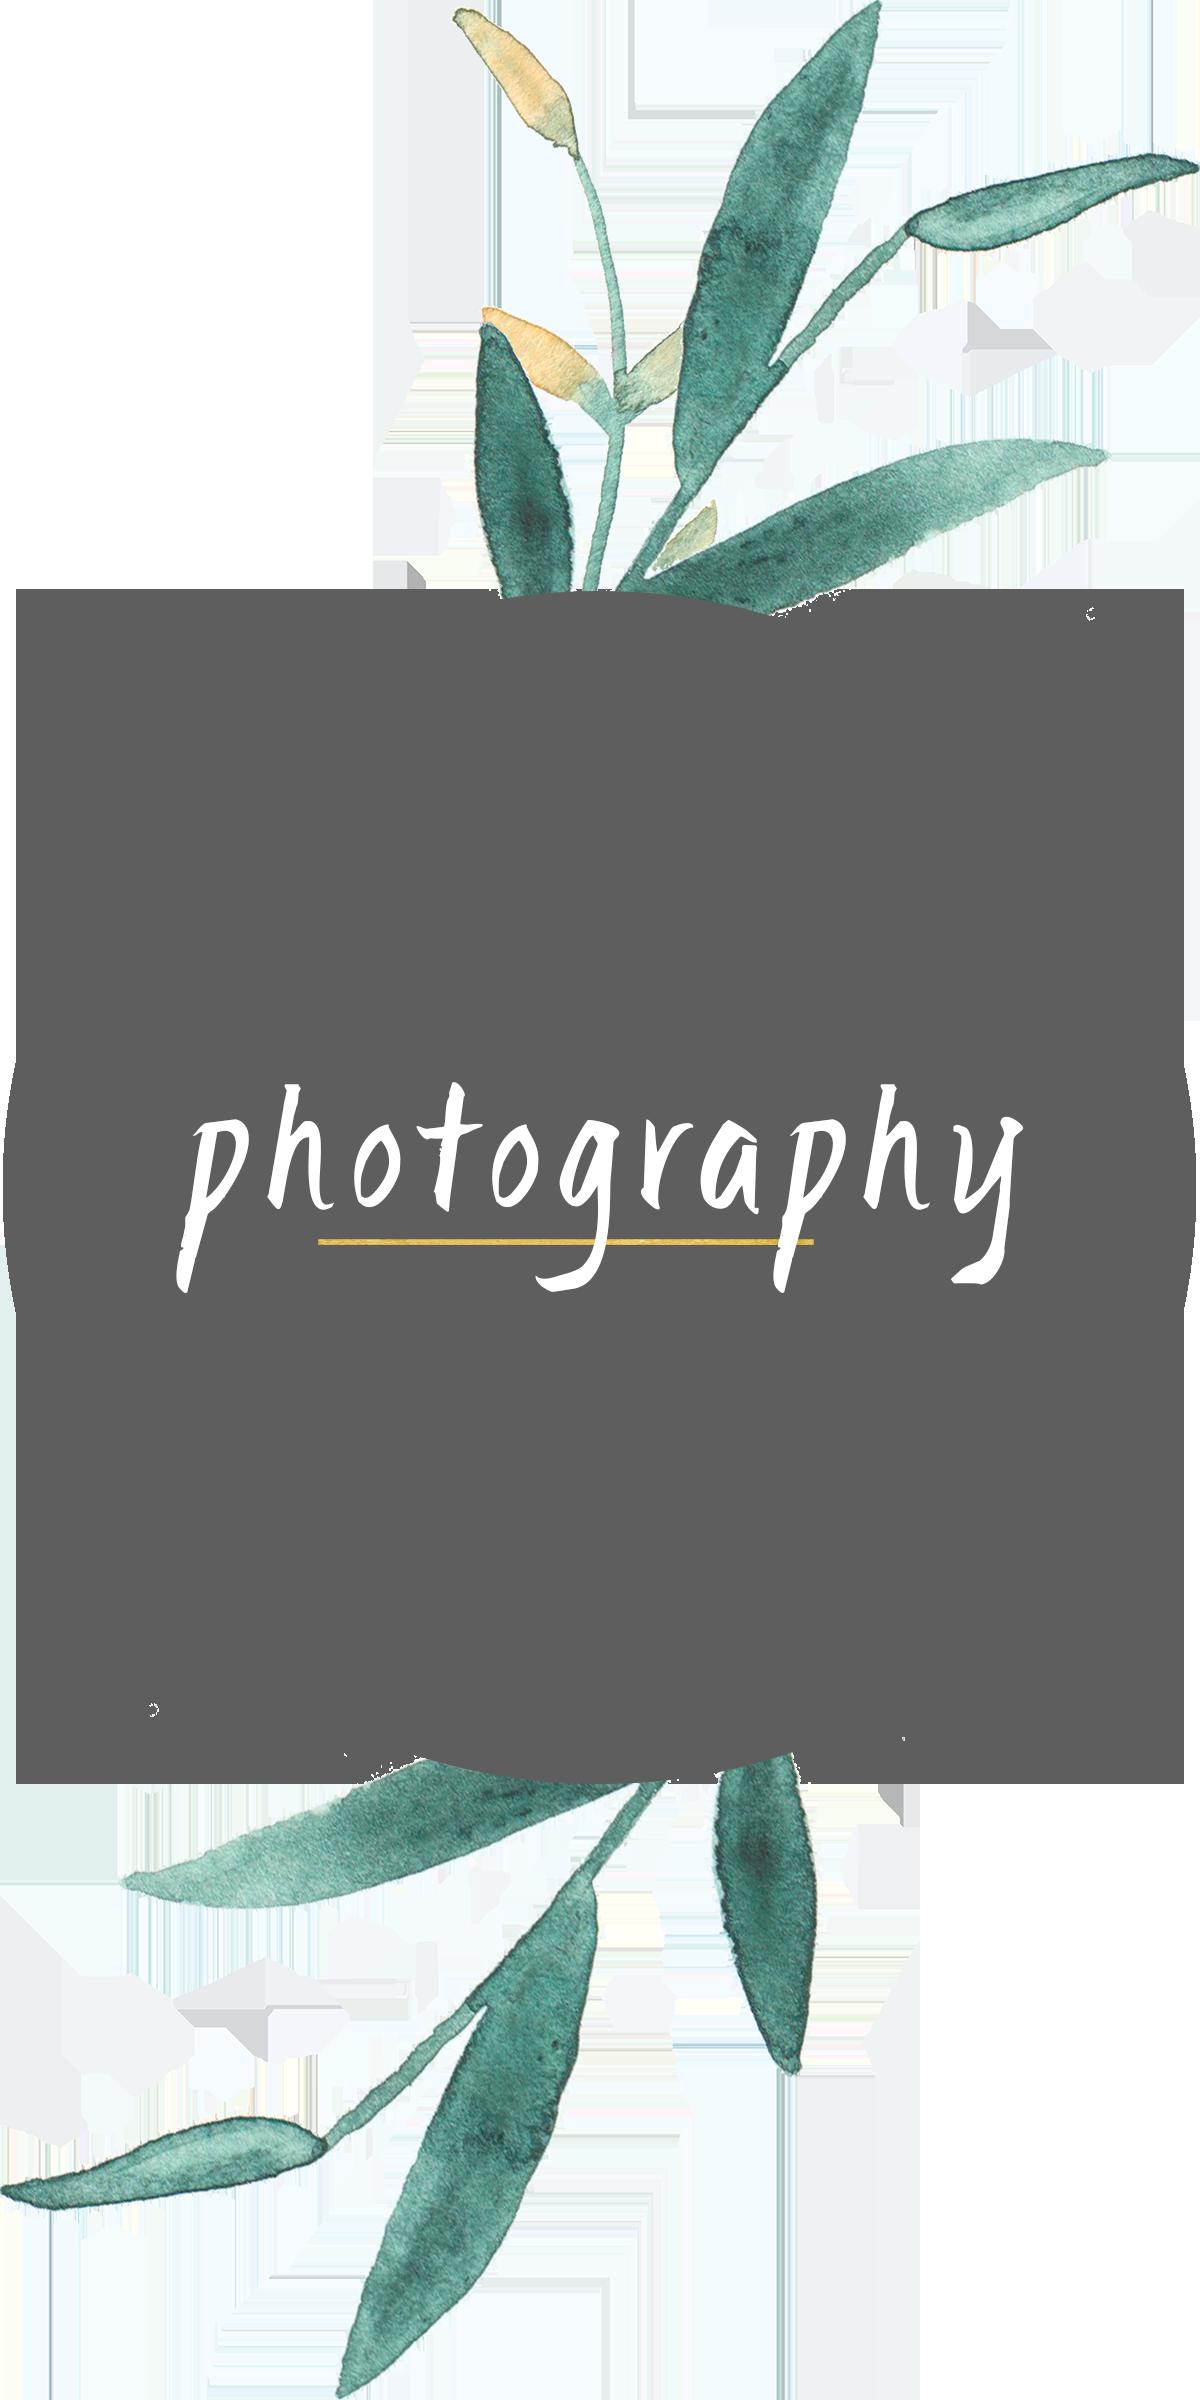 photographyclients.png